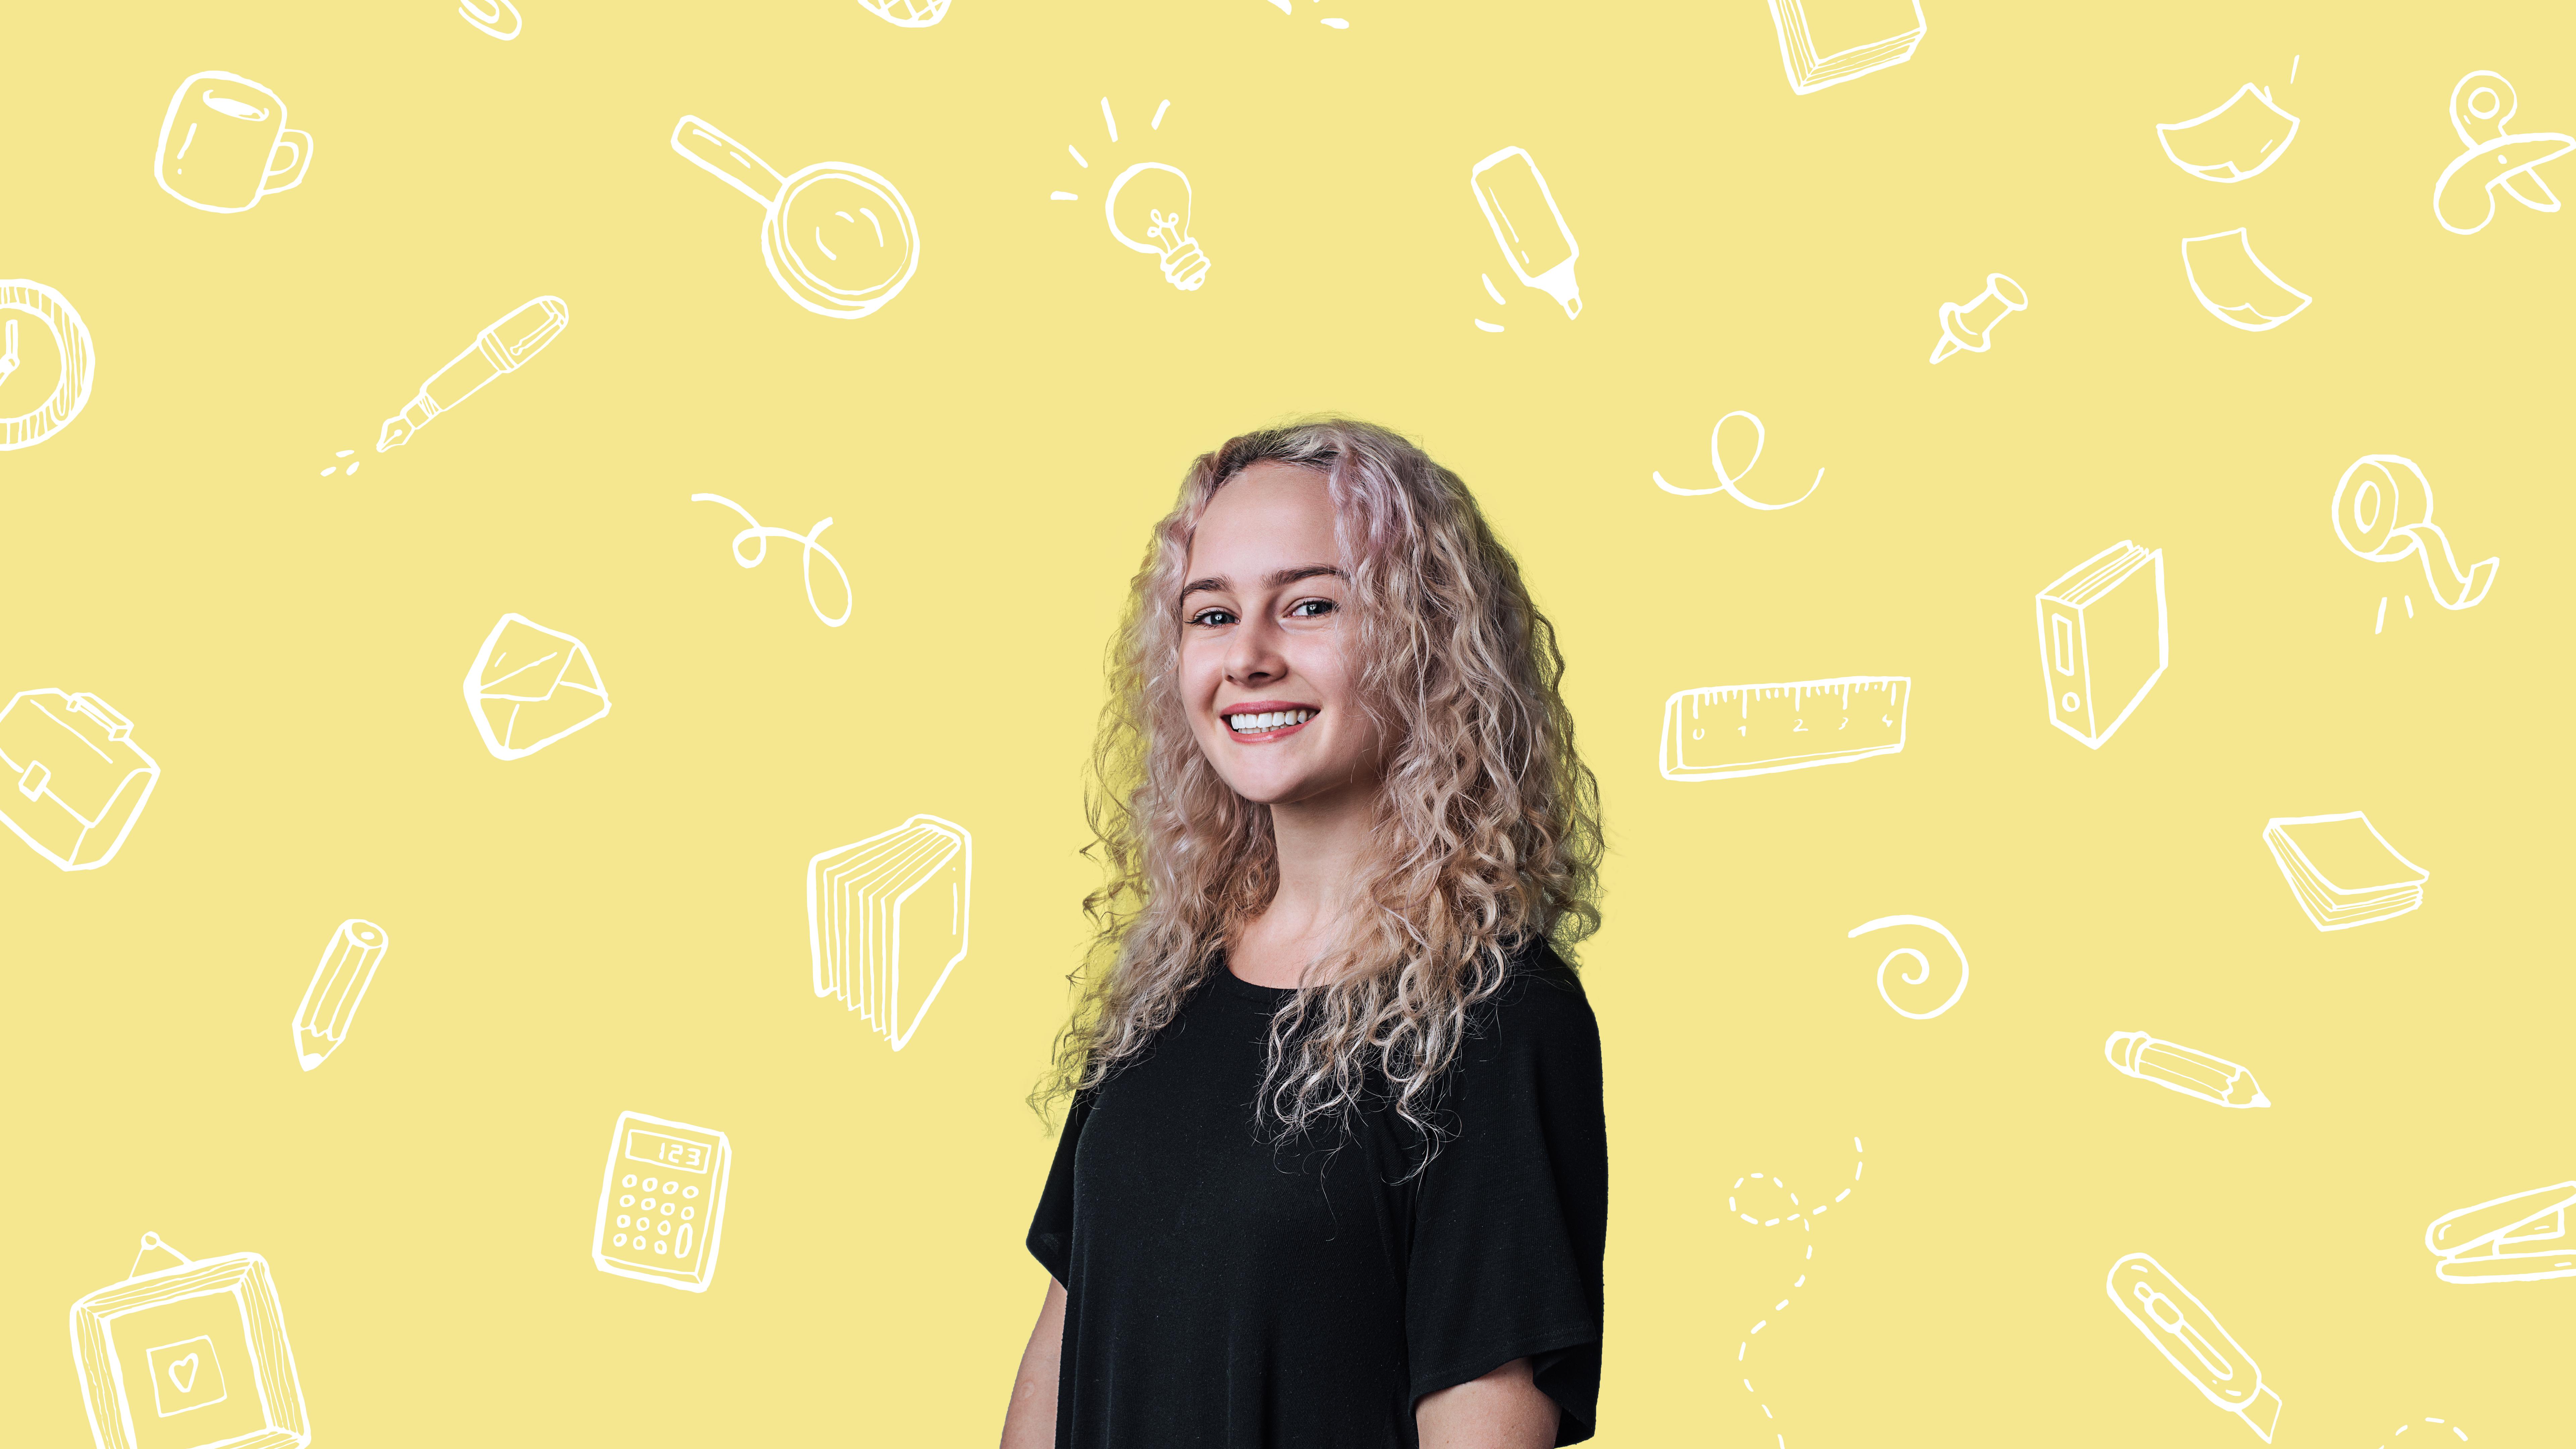 Meet Kerstin Allin, Senior Digital Executive & Plant Master